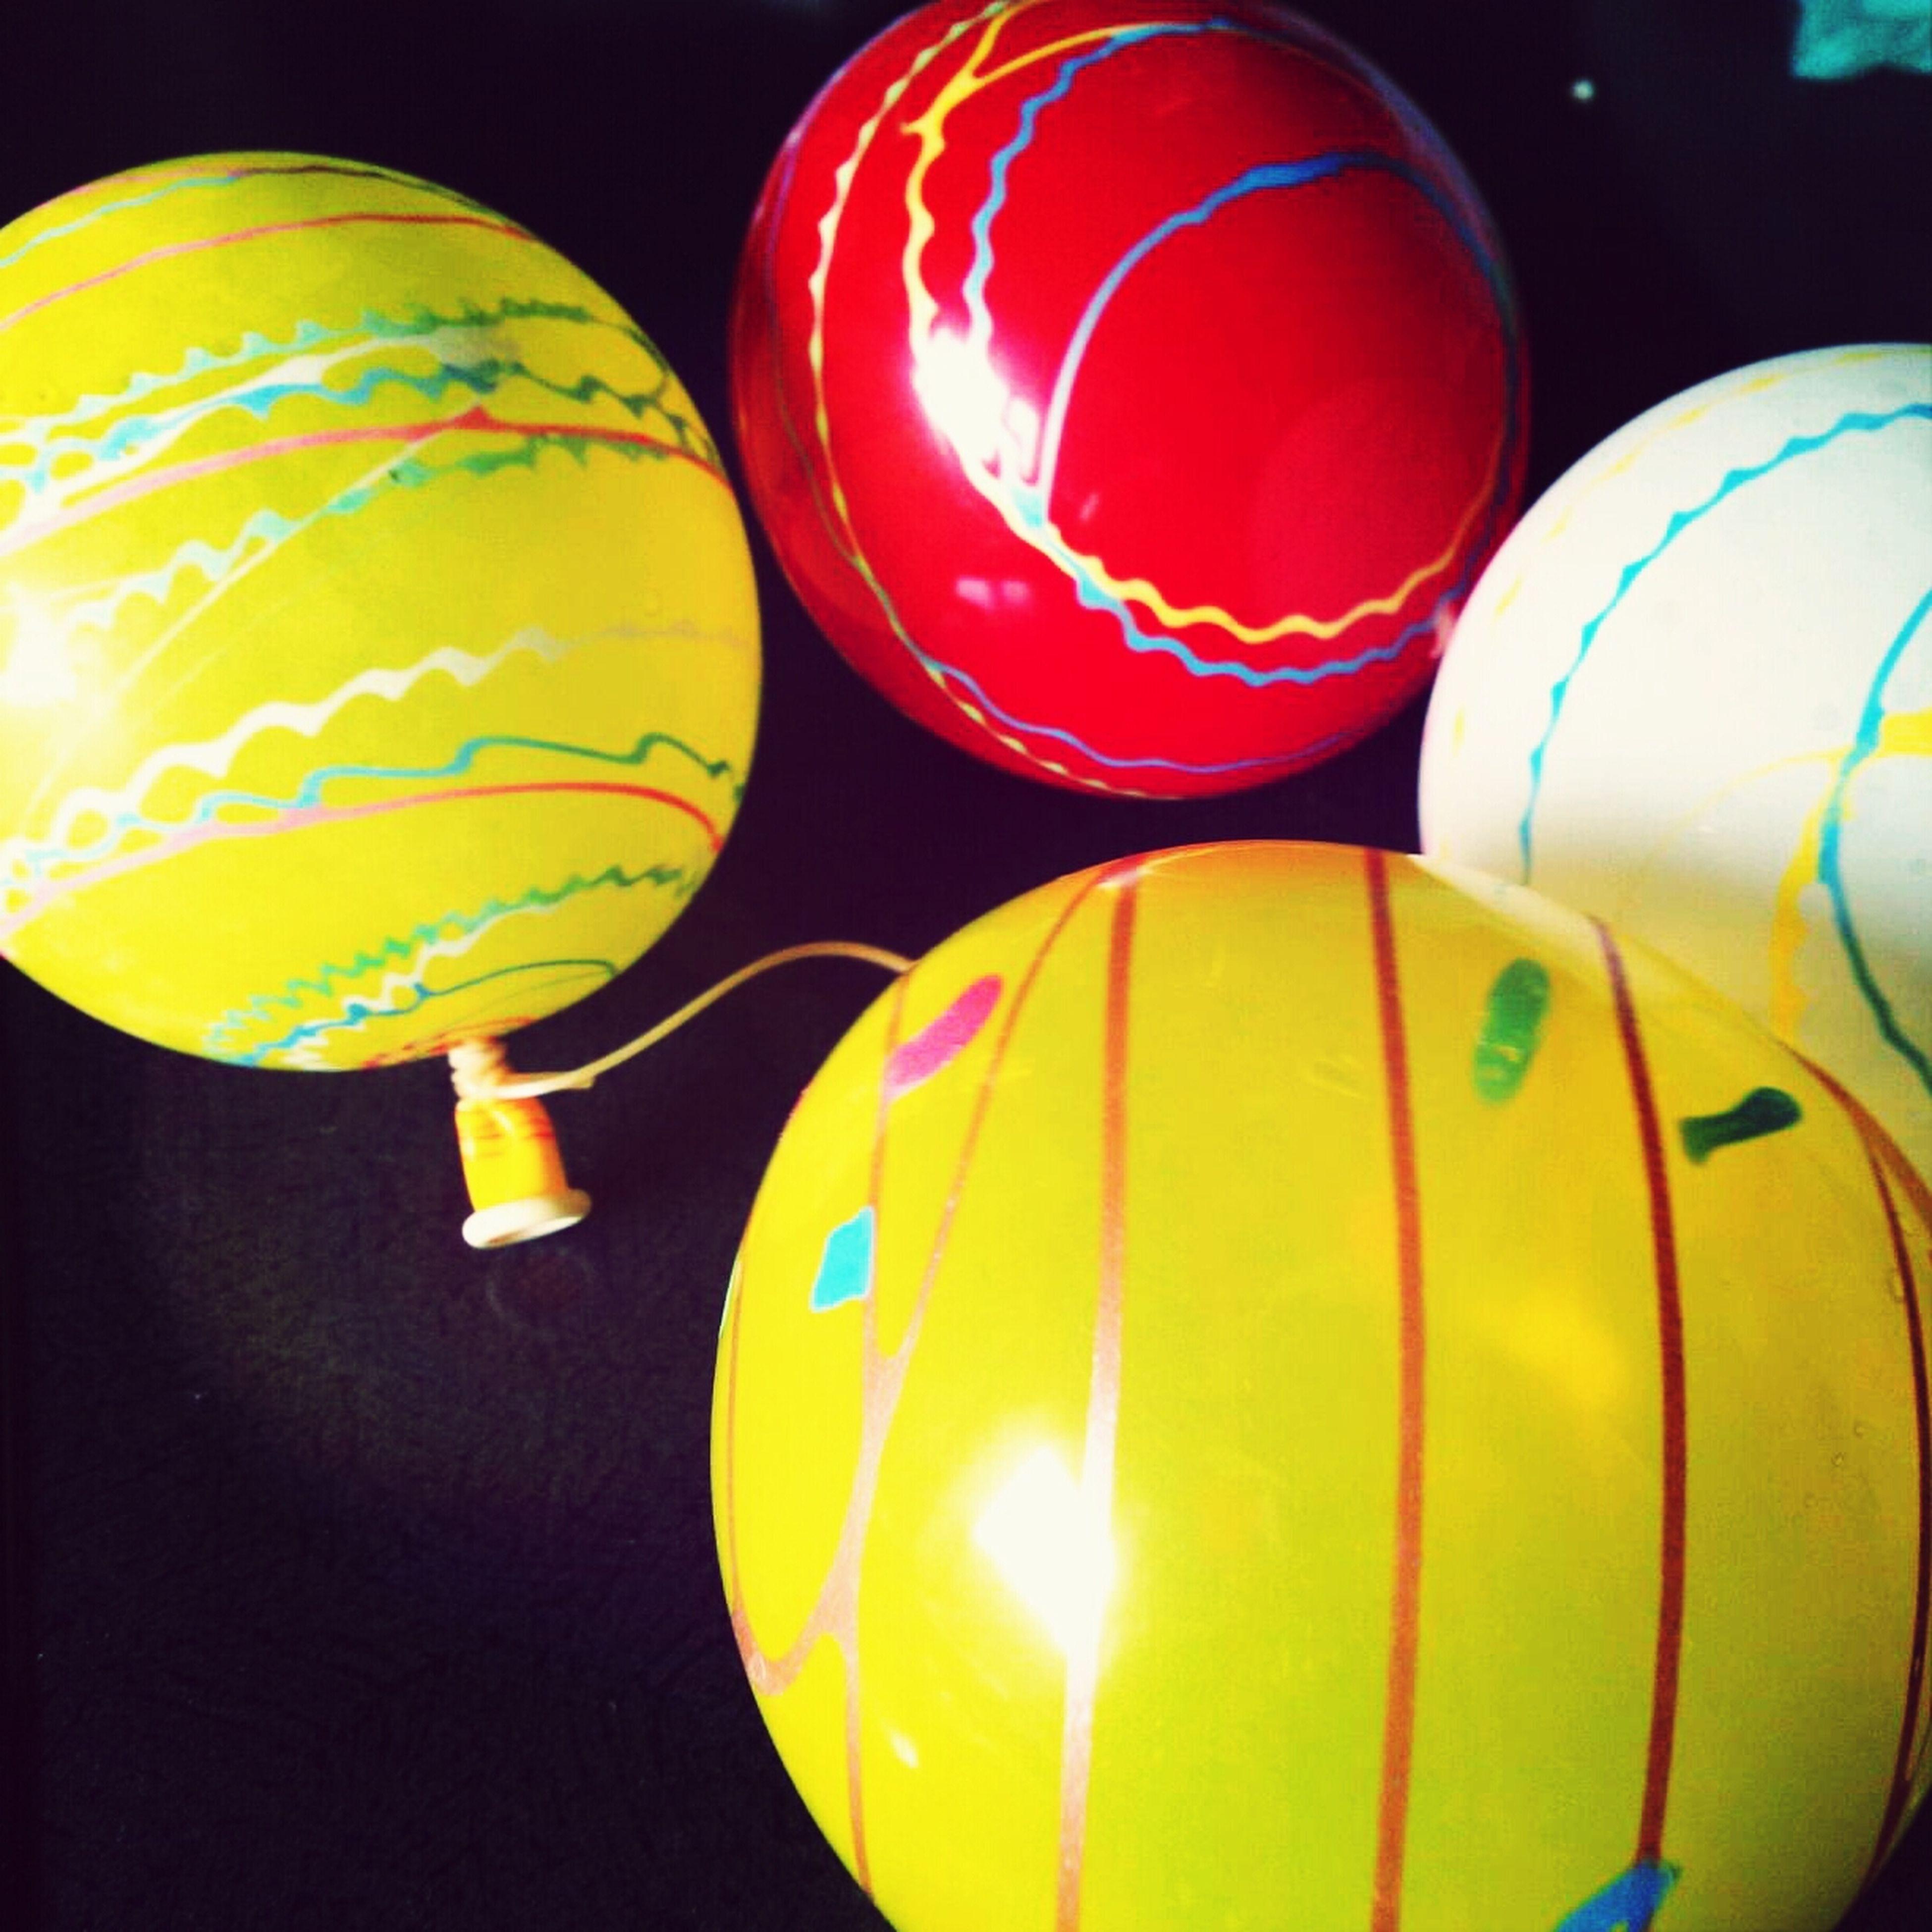 illuminated, low angle view, hot air balloon, multi colored, lighting equipment, circle, decoration, sphere, lantern, balloon, yellow, indoors, close-up, celebration, geometric shape, pattern, hanging, night, no people, shape